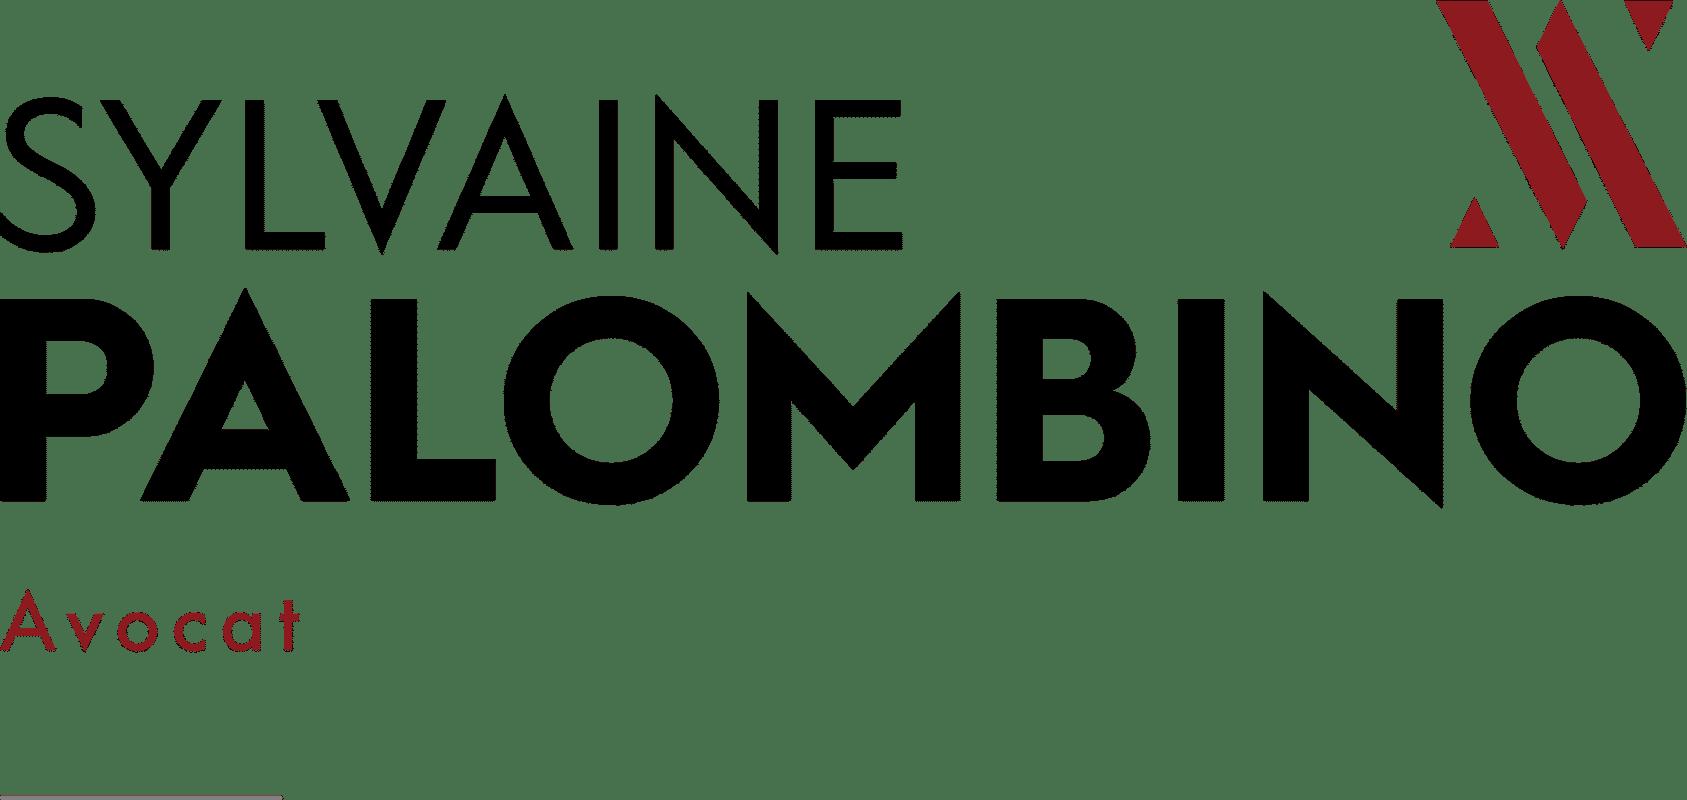 SYLVAINE PALOMBINO